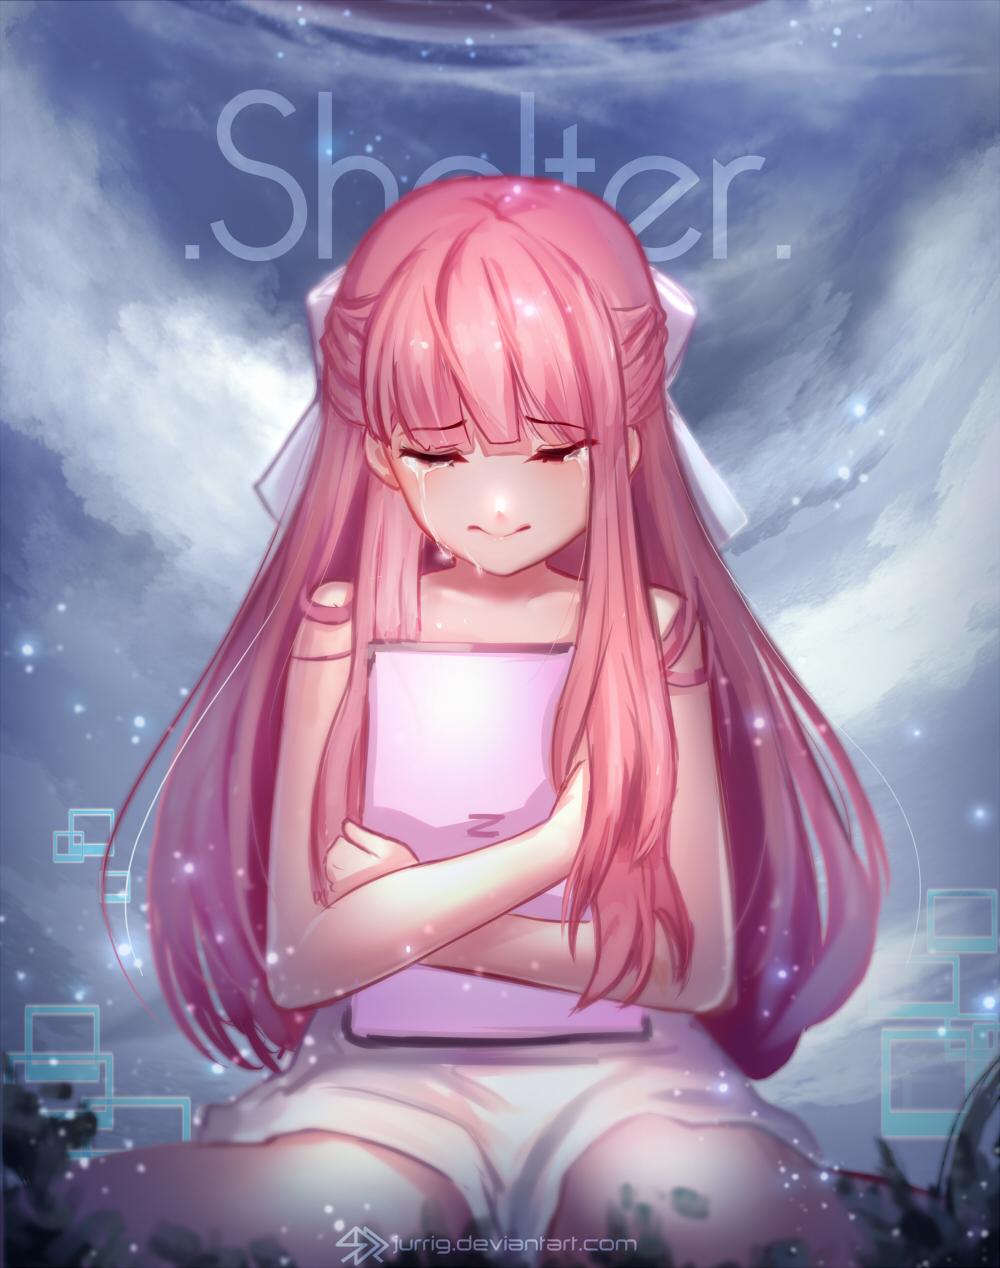 Anime Girl On Bed Gif